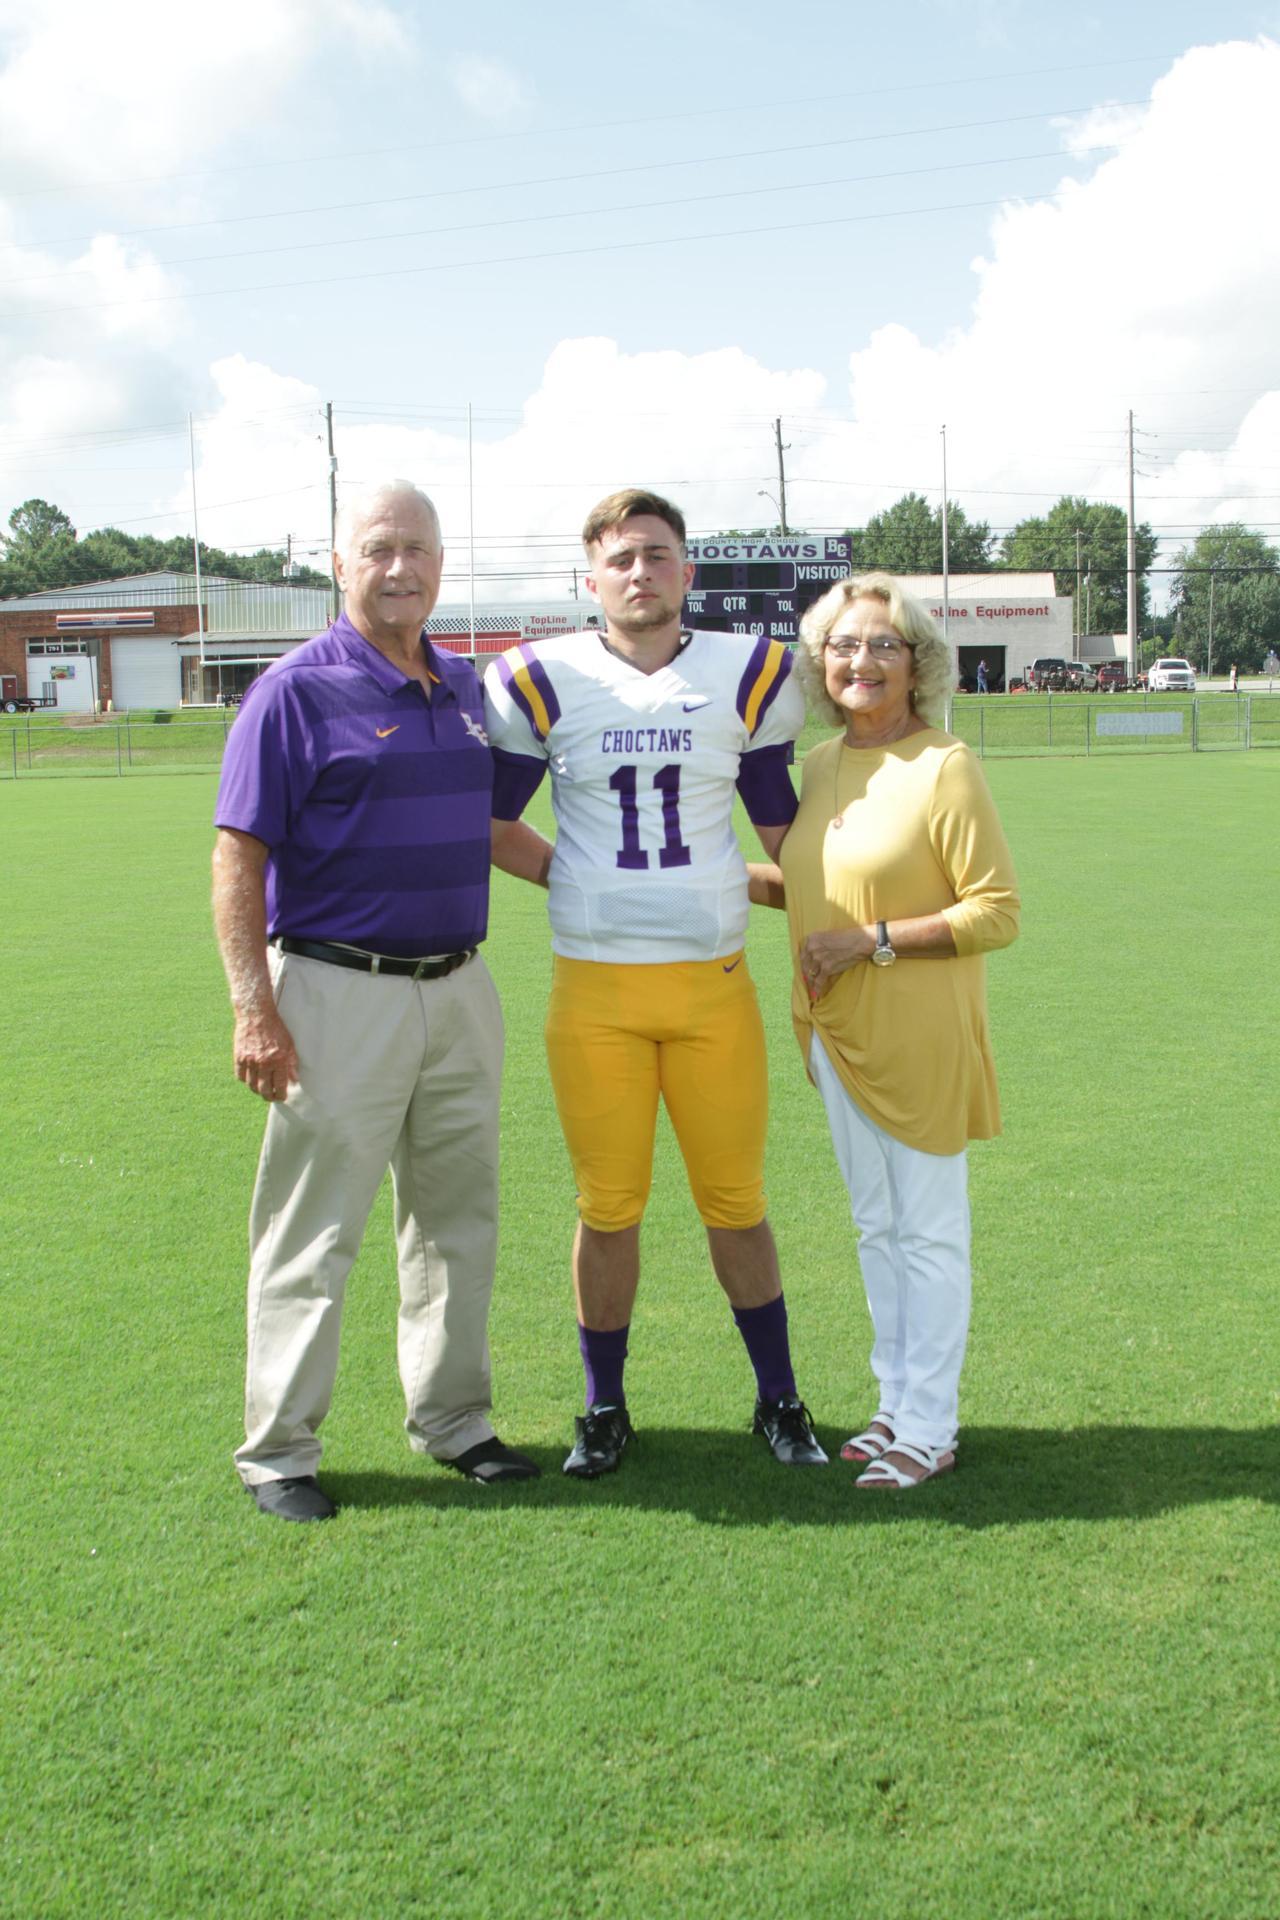 Offensive Line Coach- Cecil LaGrane, wife Sandra, grandson Trey Reese